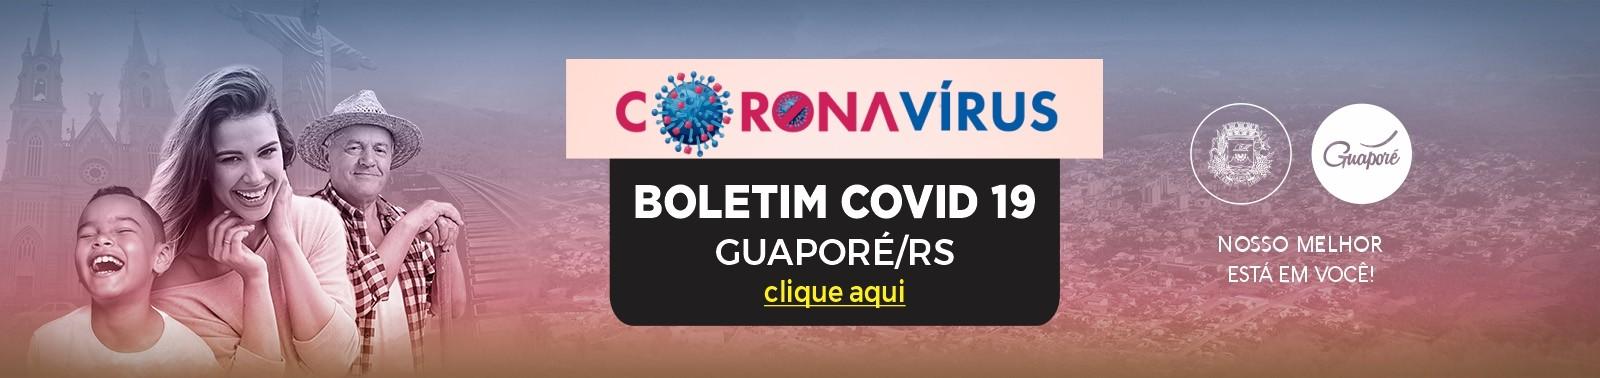 Banner 2 - CAPA - Coronavírus BOLETIM